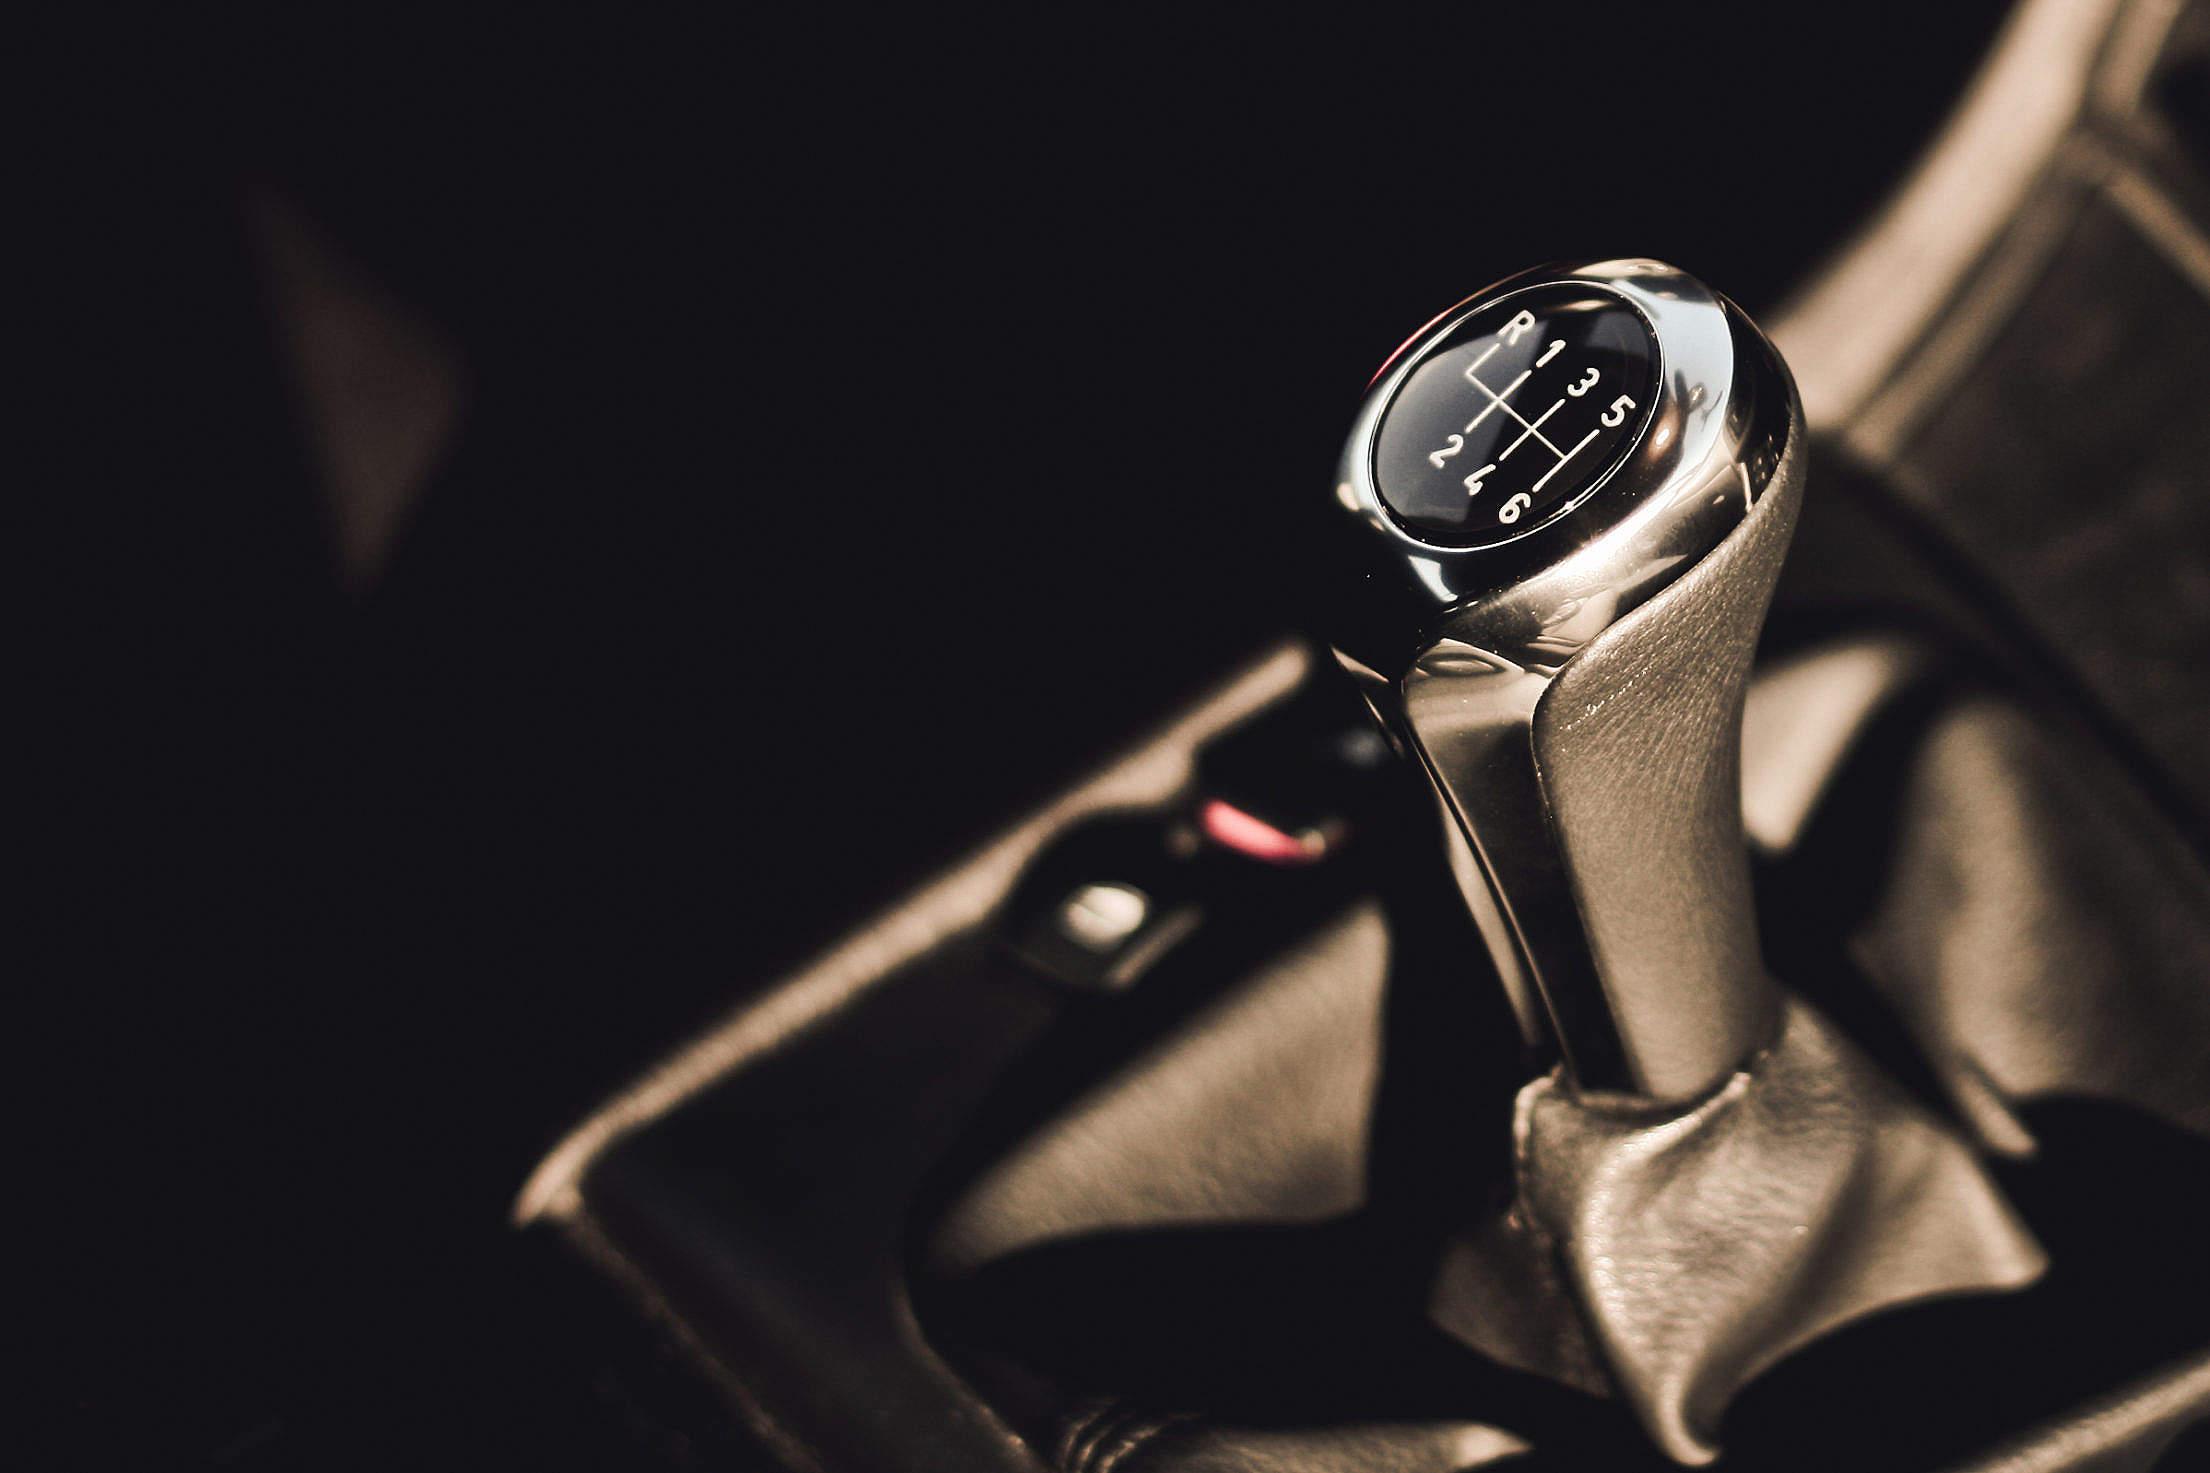 Gear Shift Selector Free Stock Photo